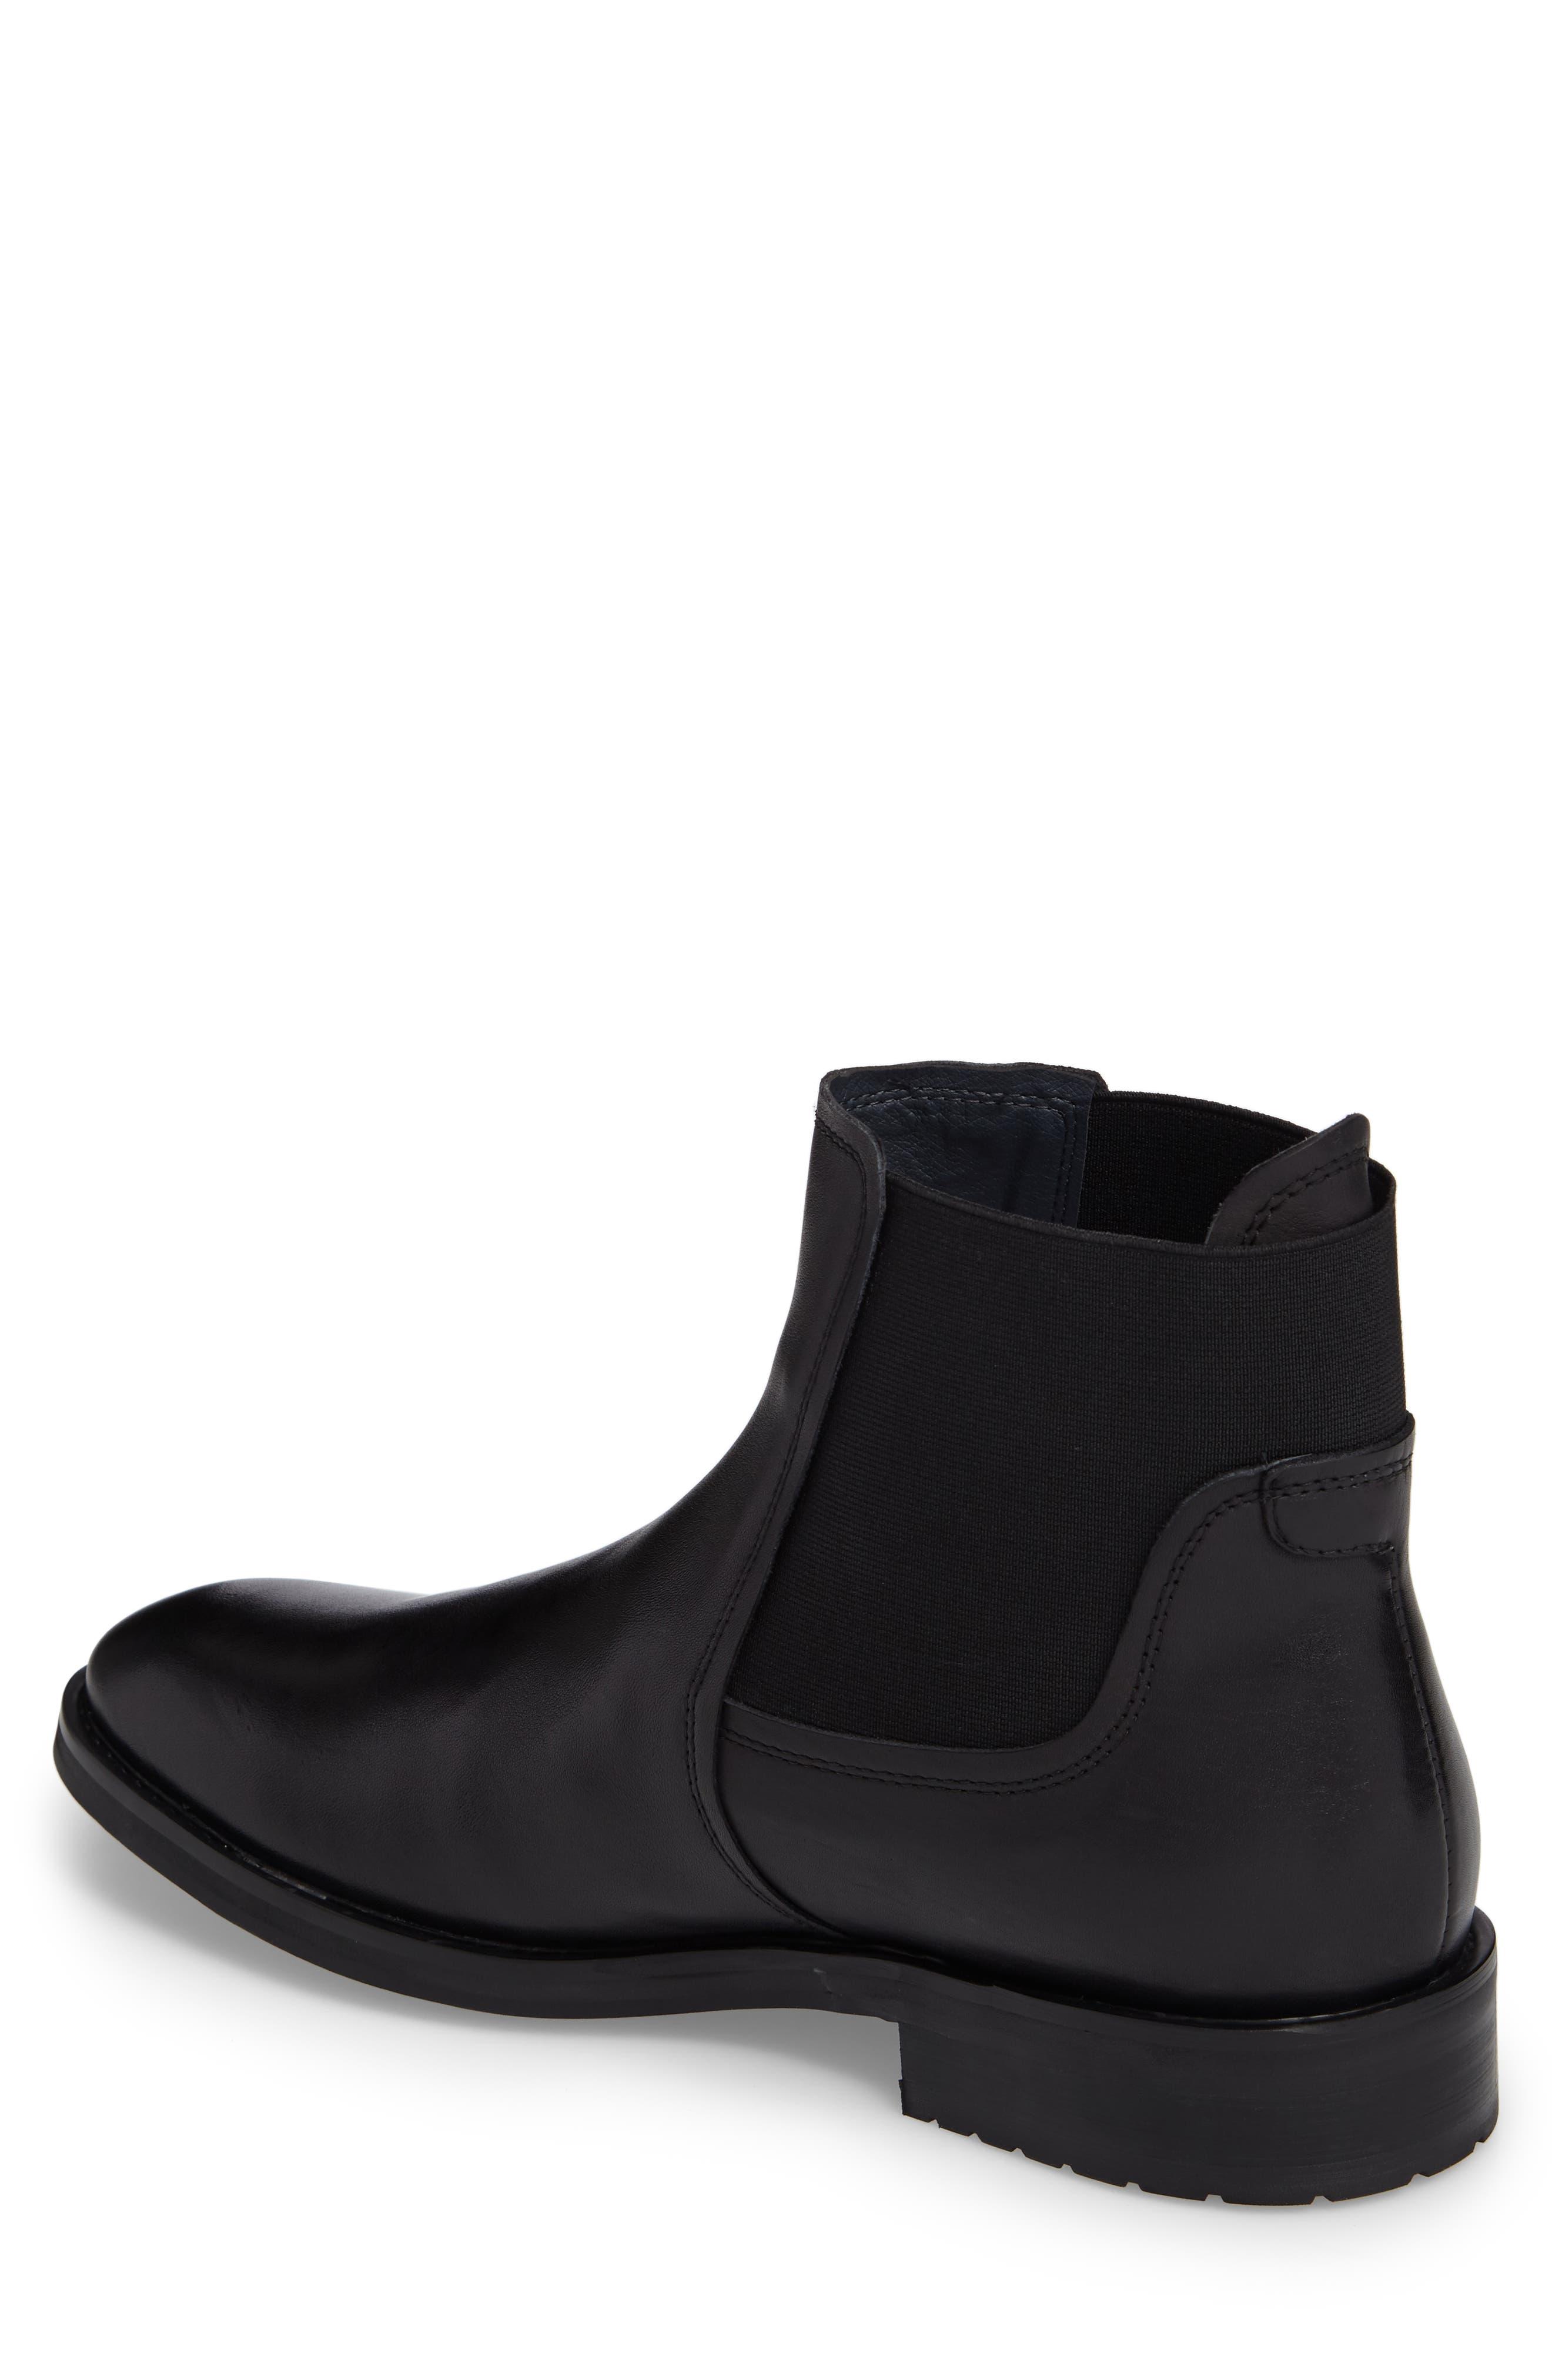 Belmont Chelsea Boot,                             Alternate thumbnail 2, color,                             Black Leather